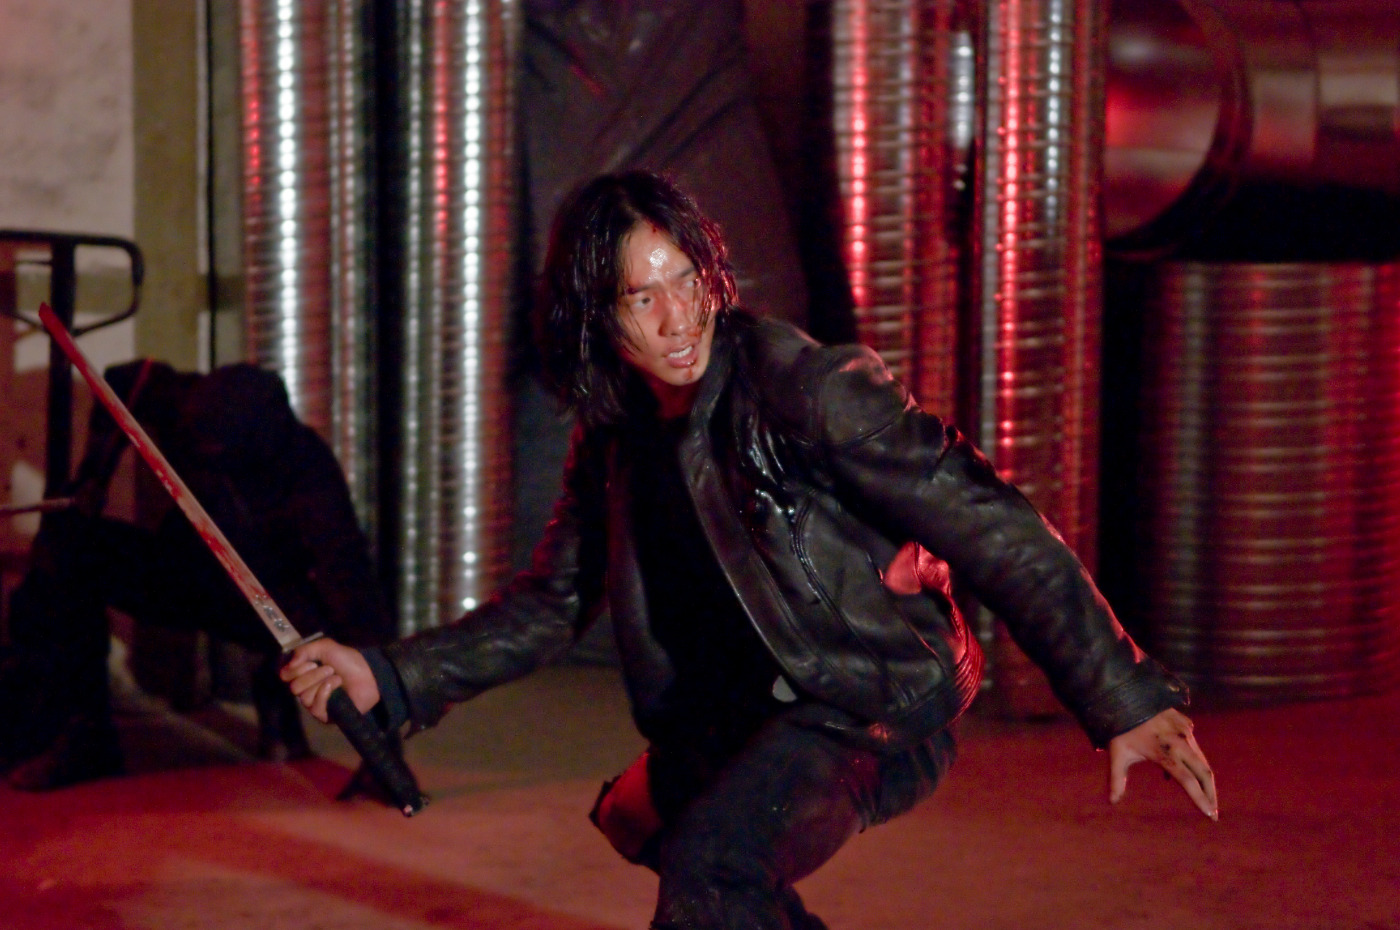 ninja assassin free movies